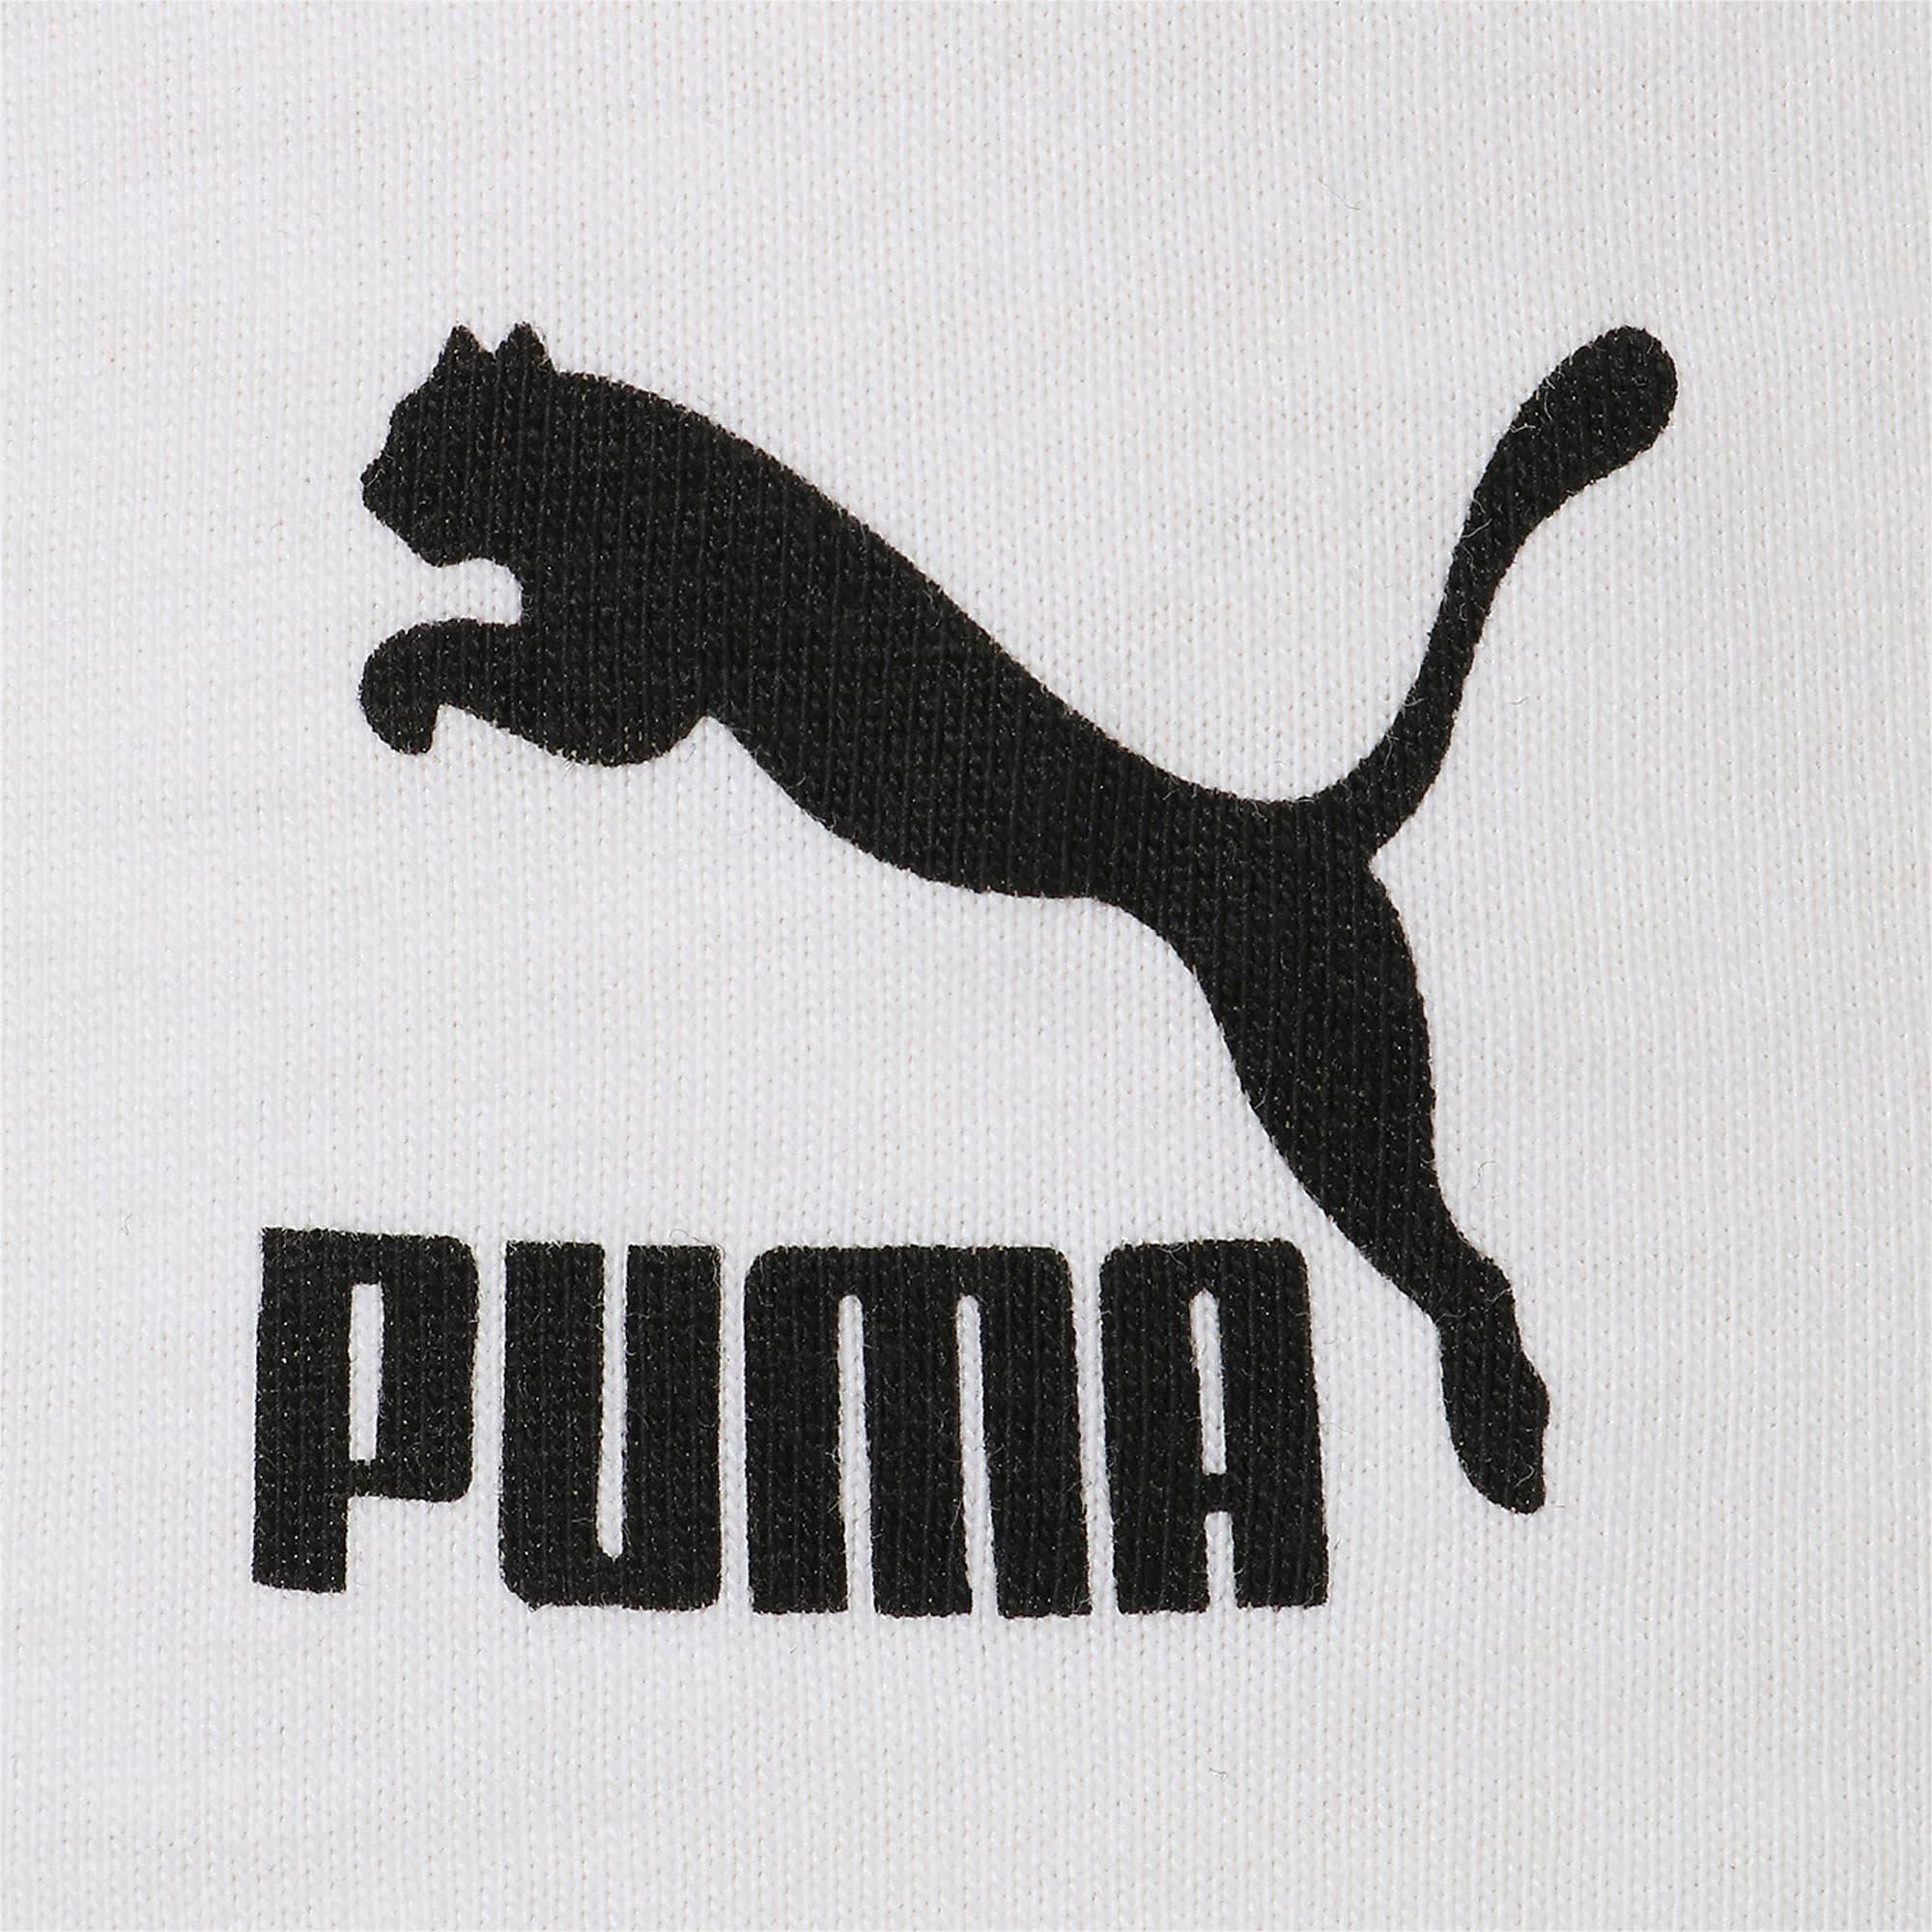 Thumbnail 7 of プーマ XTG ウィメンズ CB SS Tシャツ 半袖, Puma White, medium-JPN